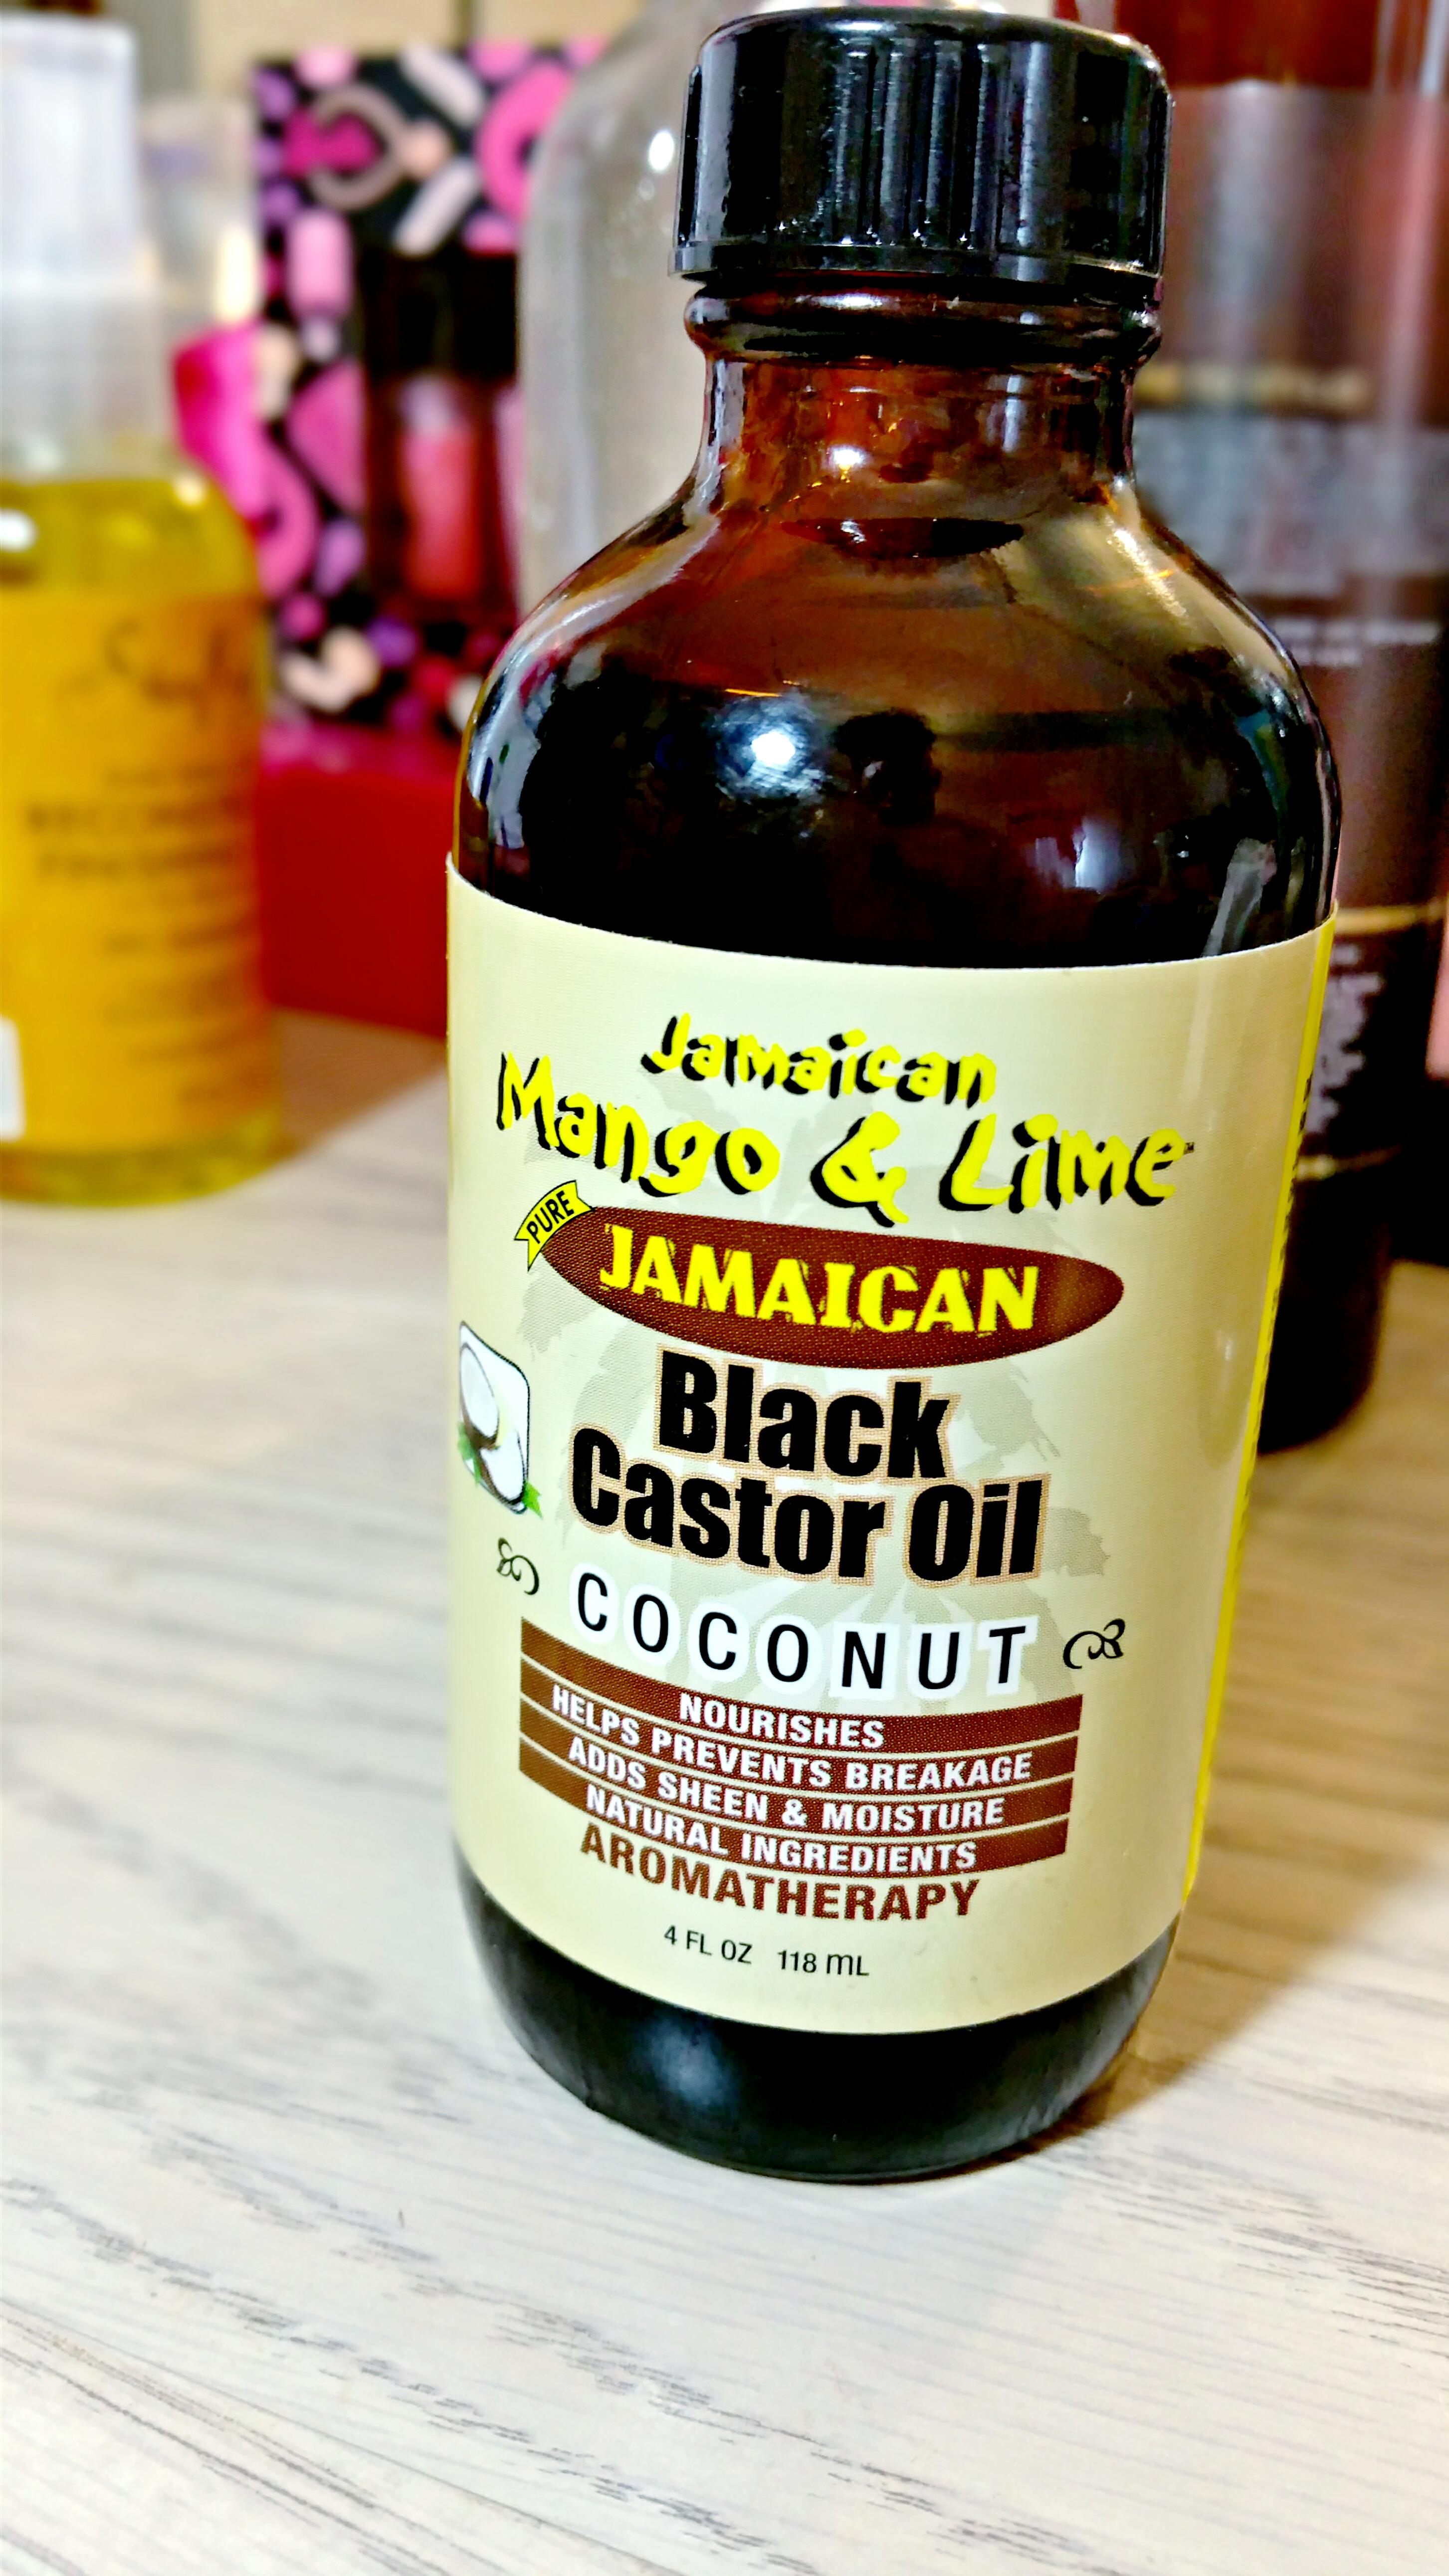 hair addiction jamaican mango lime coconut black castor oil fancieland. Black Bedroom Furniture Sets. Home Design Ideas